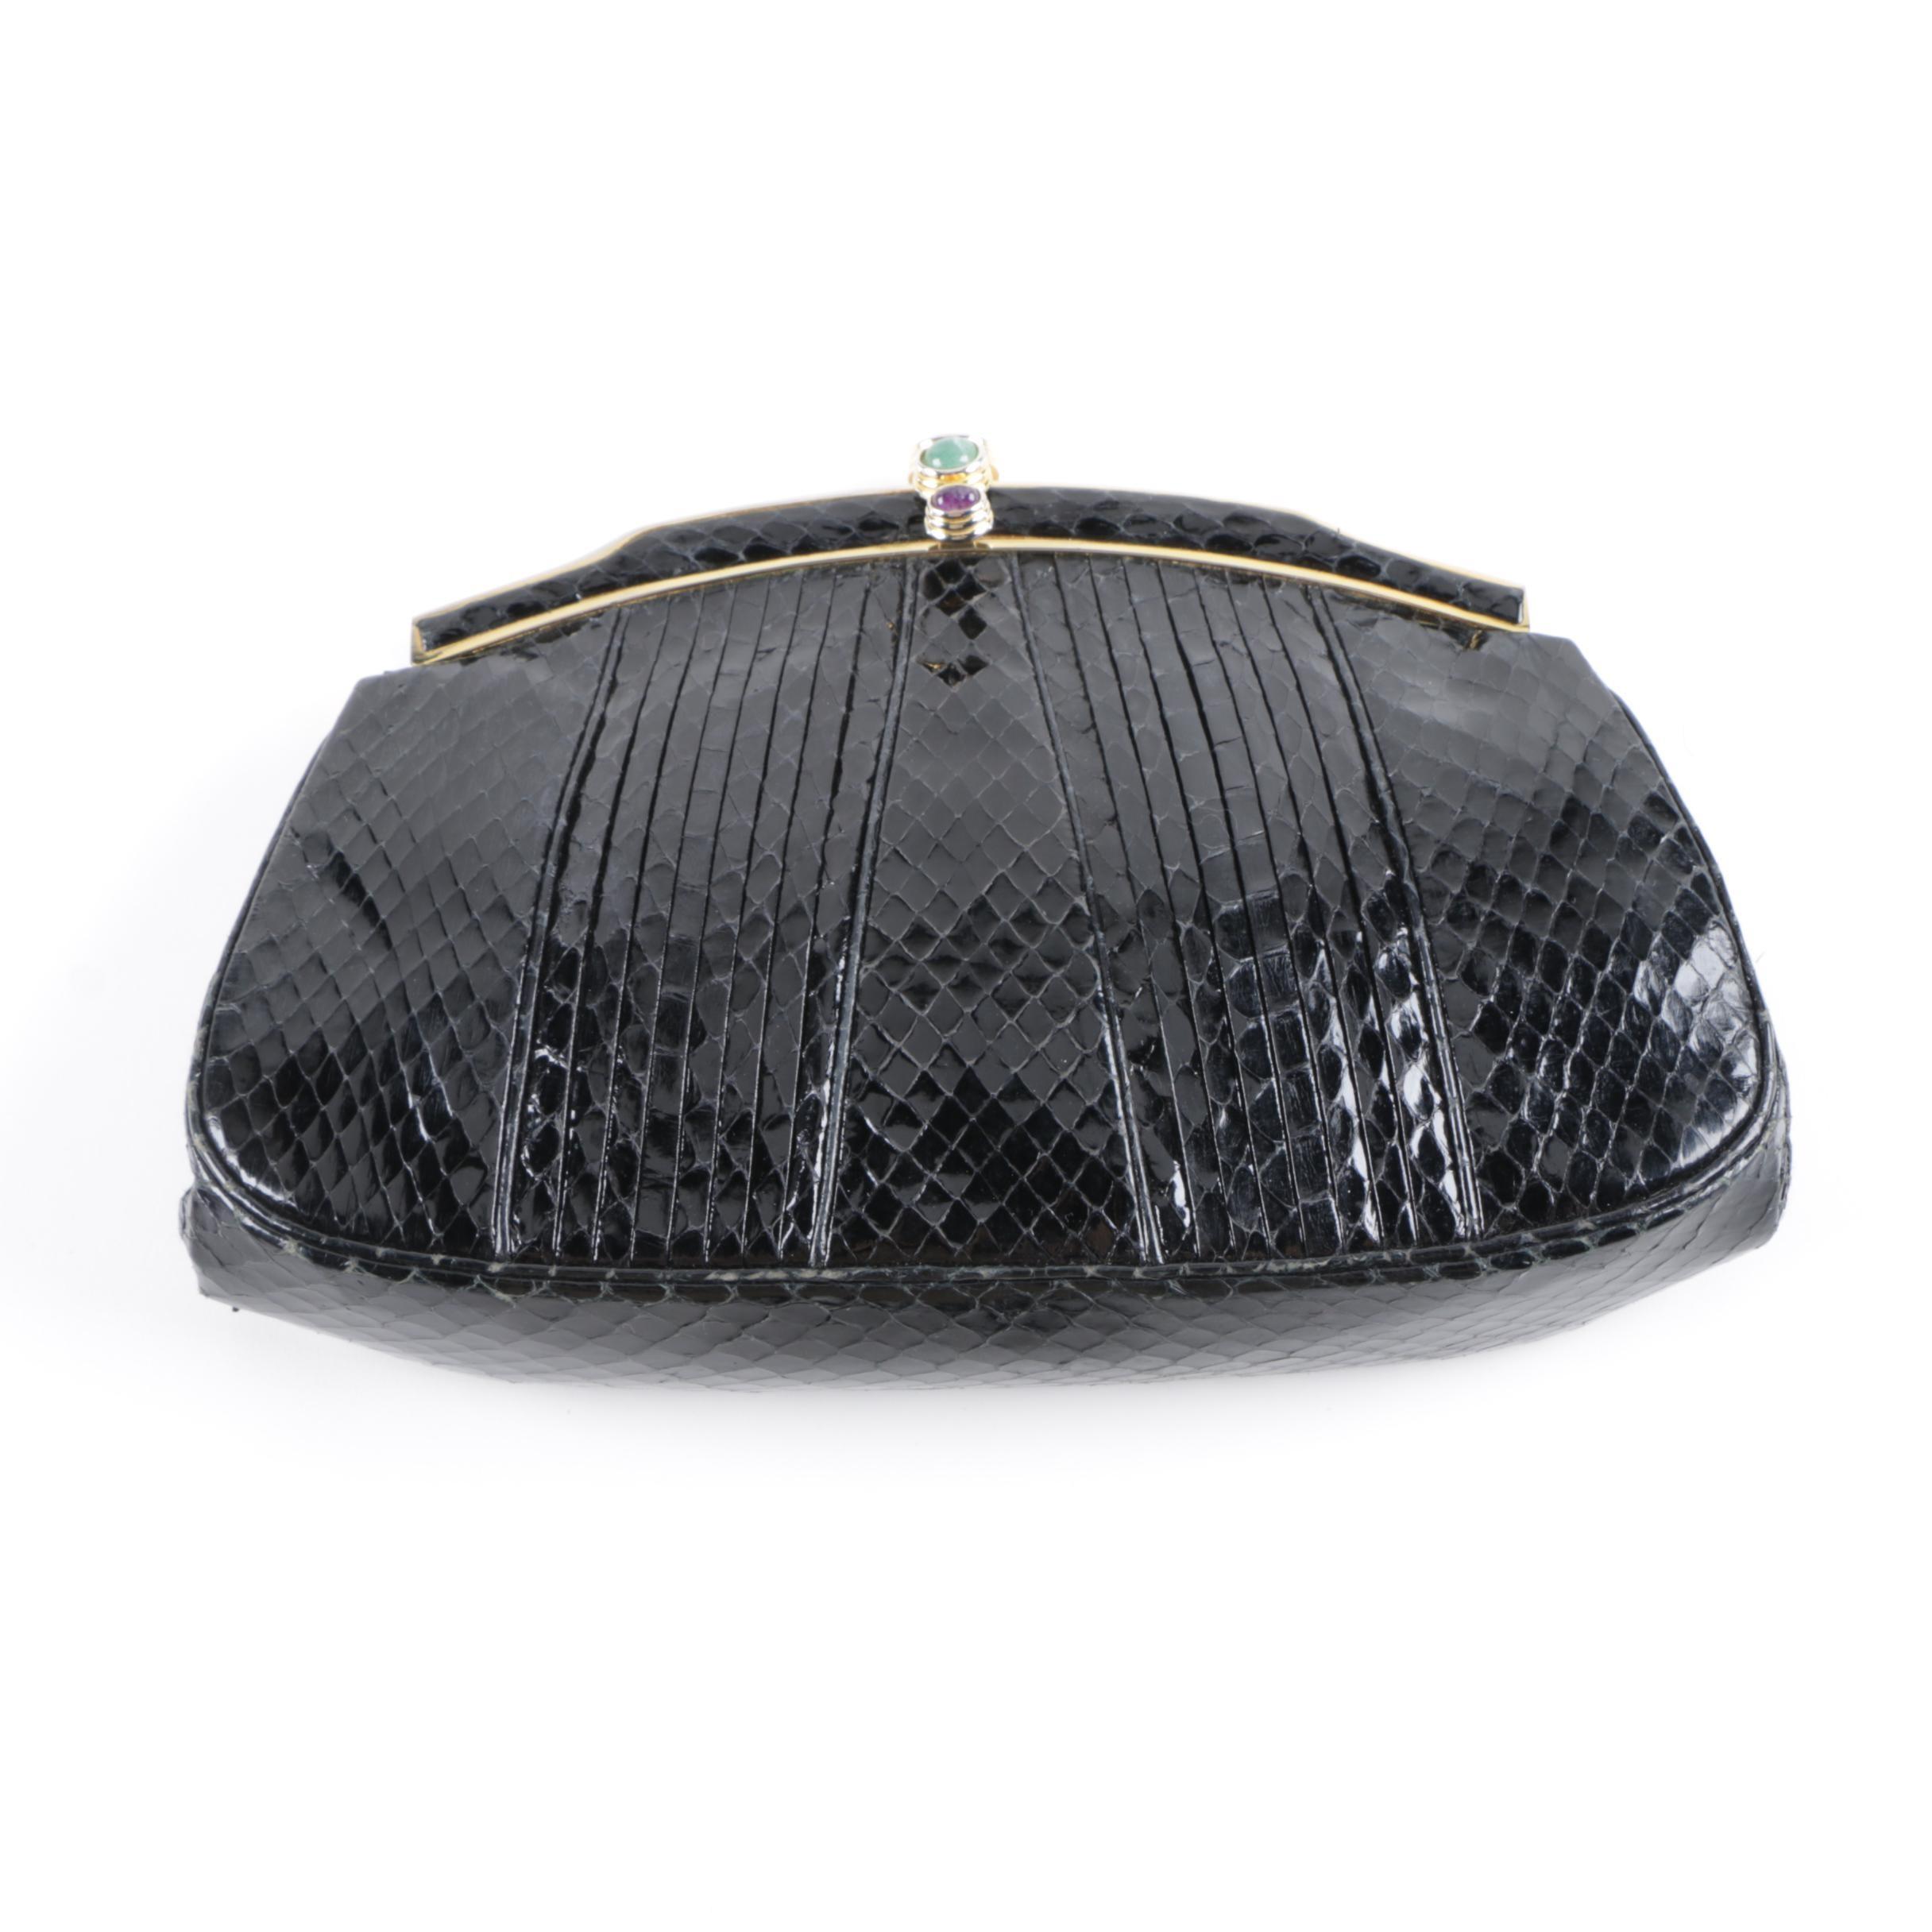 Judith Leiber Black Snakeskin Clutch Bag with Semi-Precious Stones